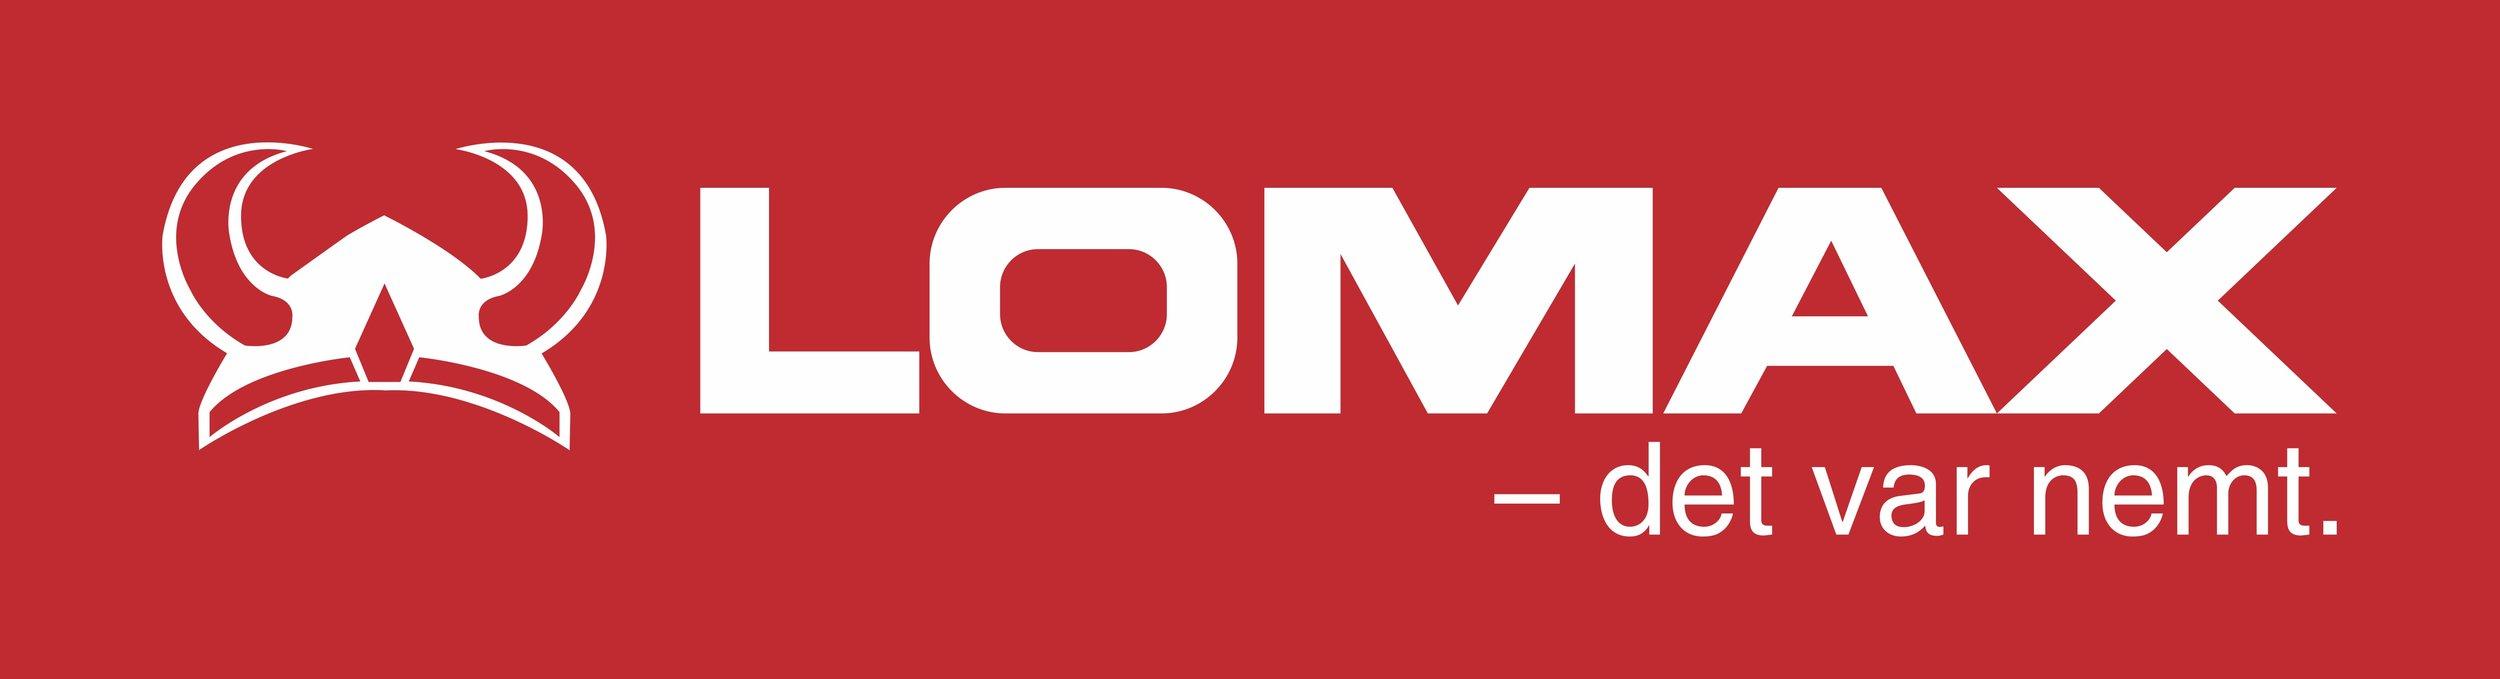 LOMAX.jpg